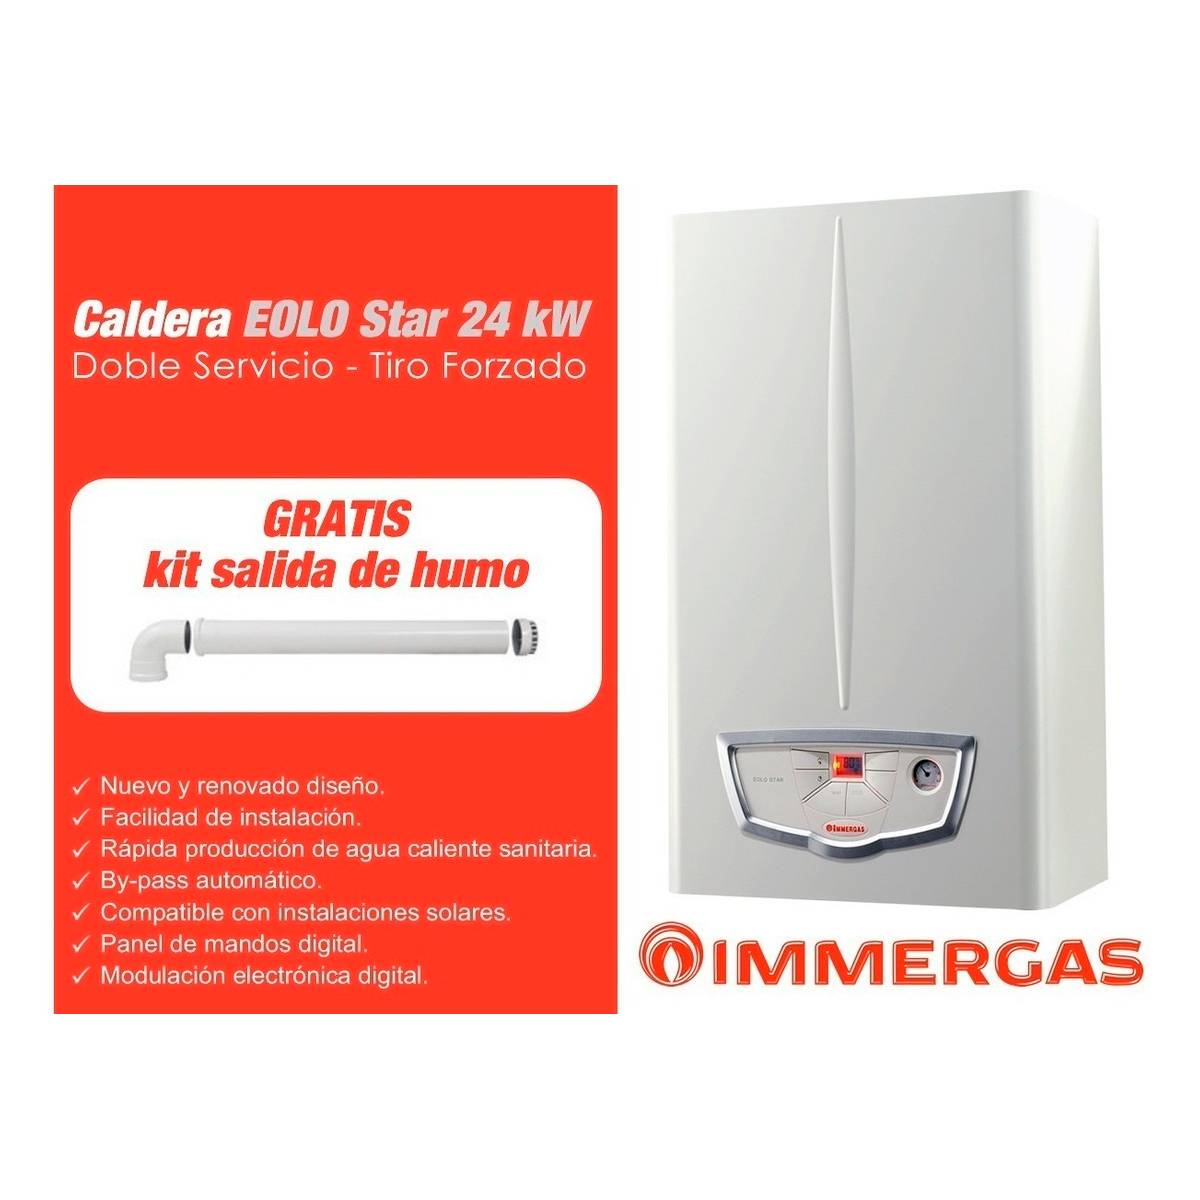 CAL-SRD-0038-c